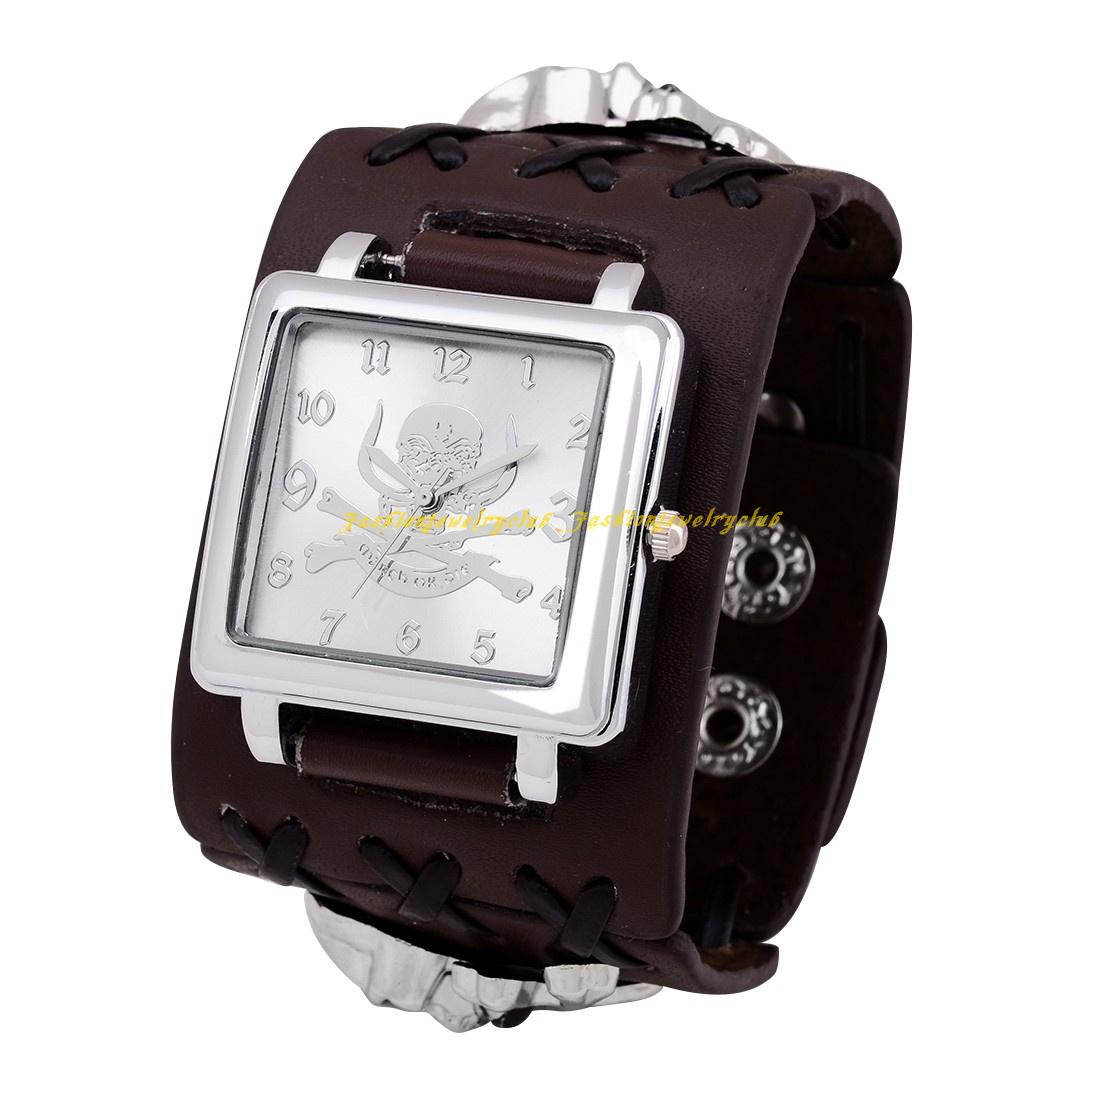 brown_leather_band_quartz_wrist_watch_men_women_punk_skull_digital_dial_watches_5.jpg